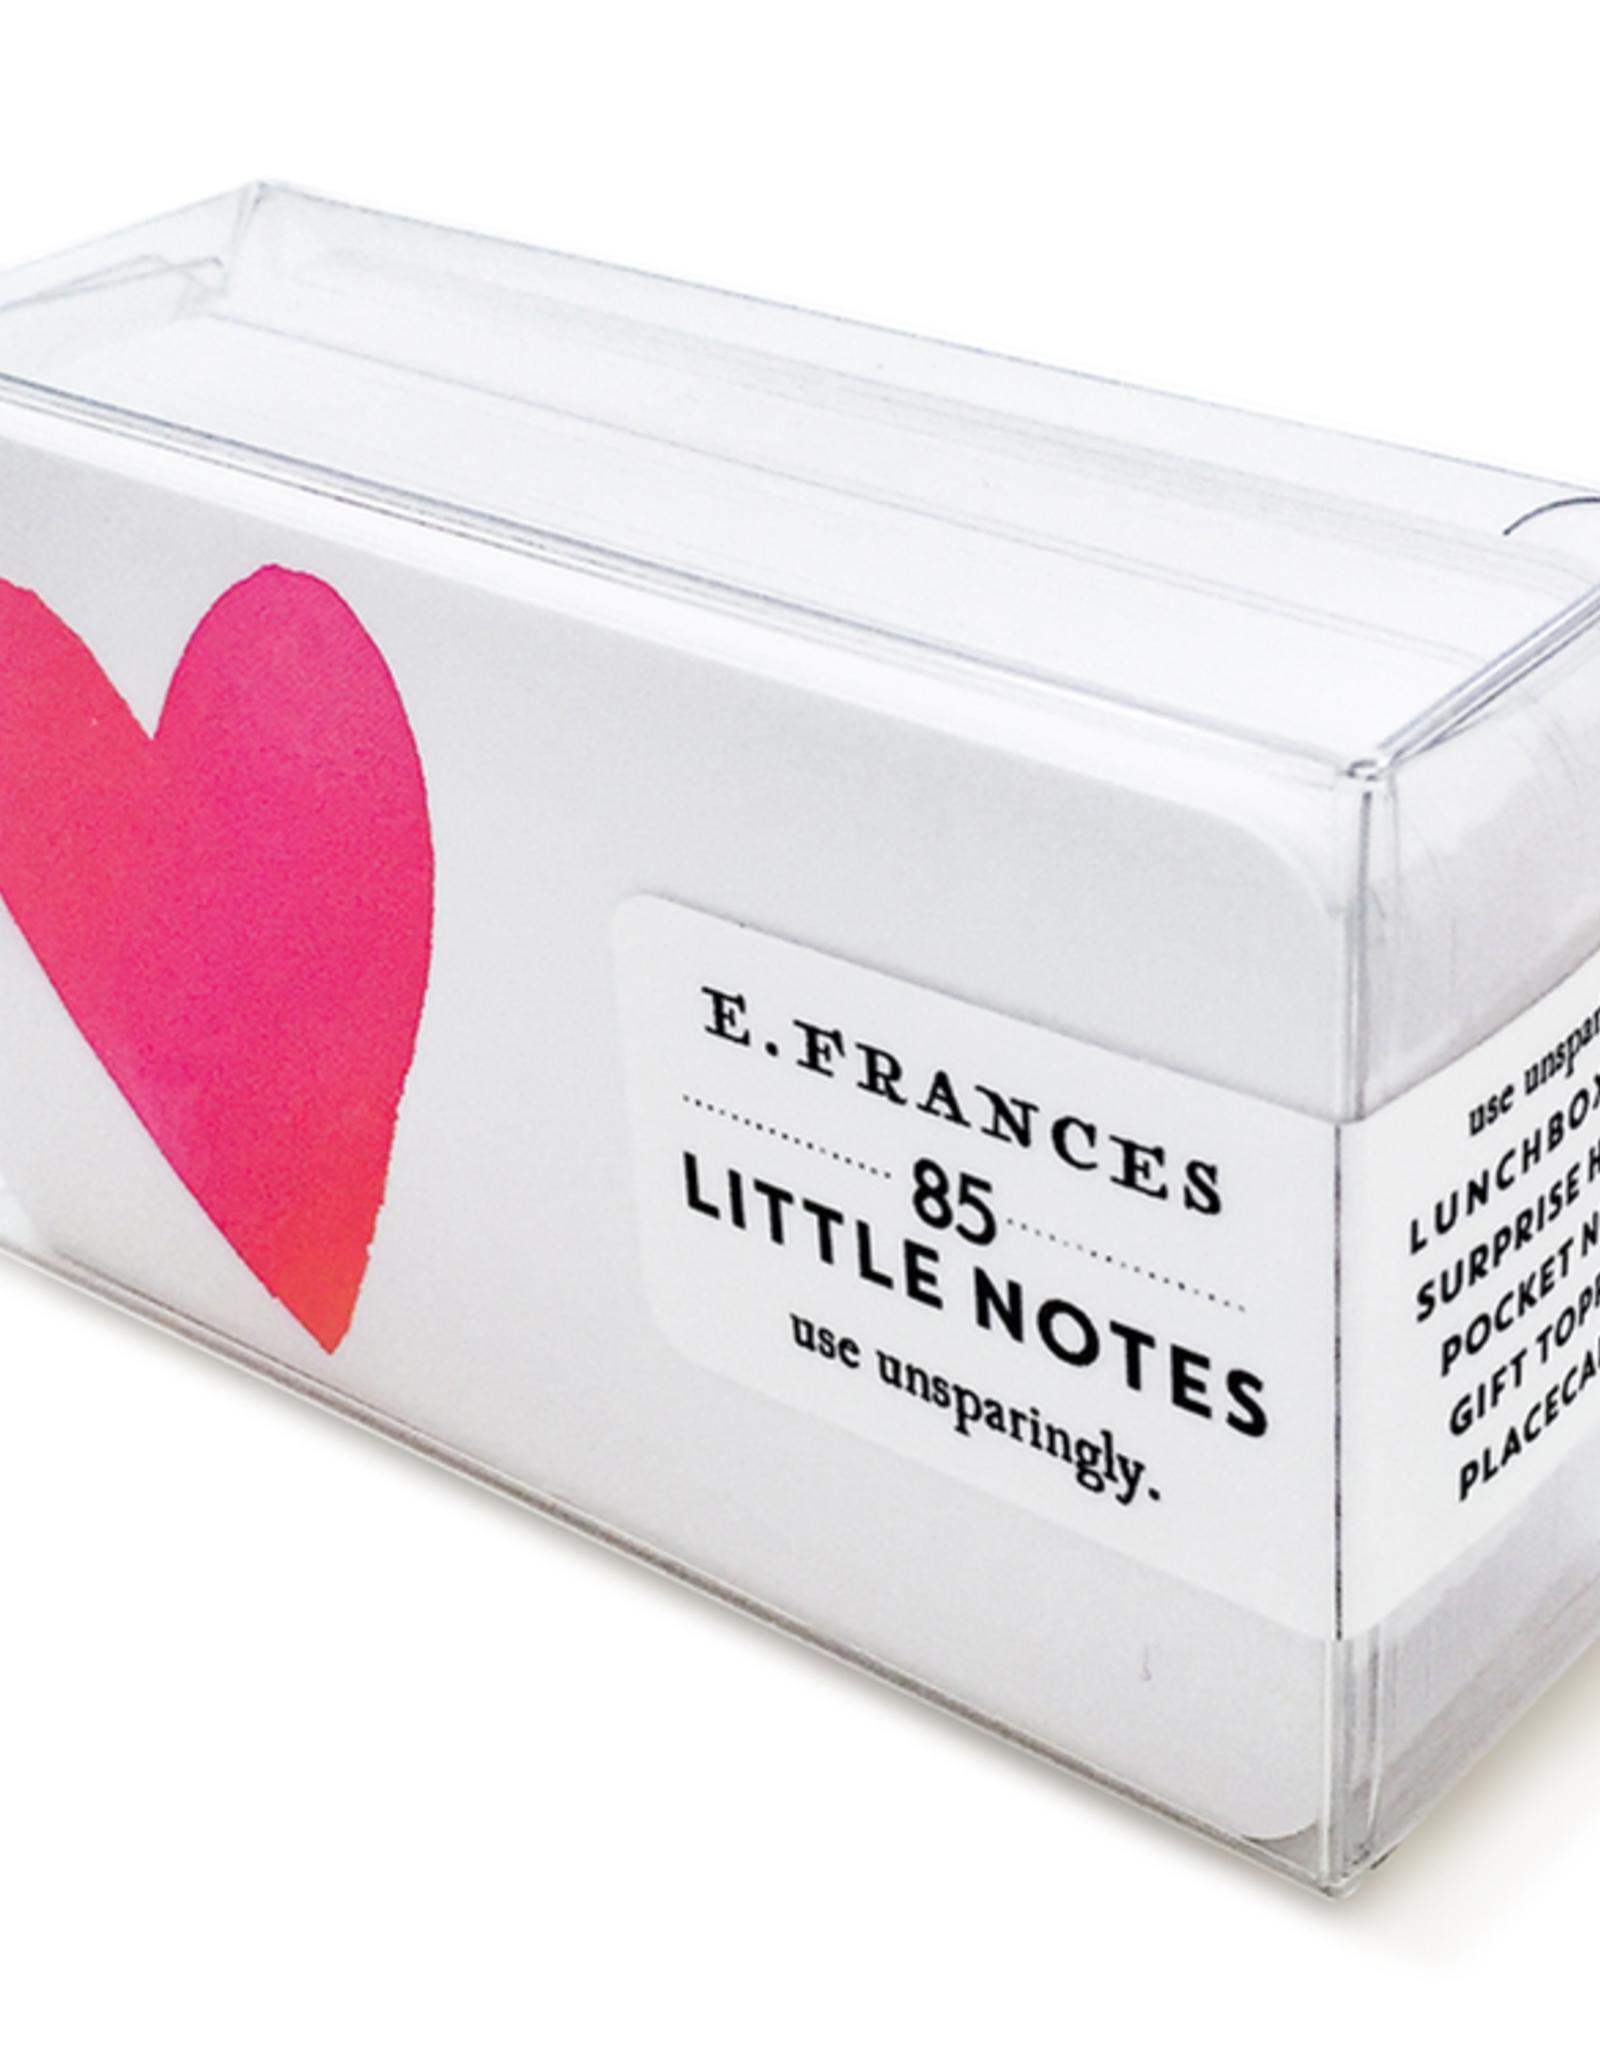 E. Frances E. Frances Little Notes - Big Heart